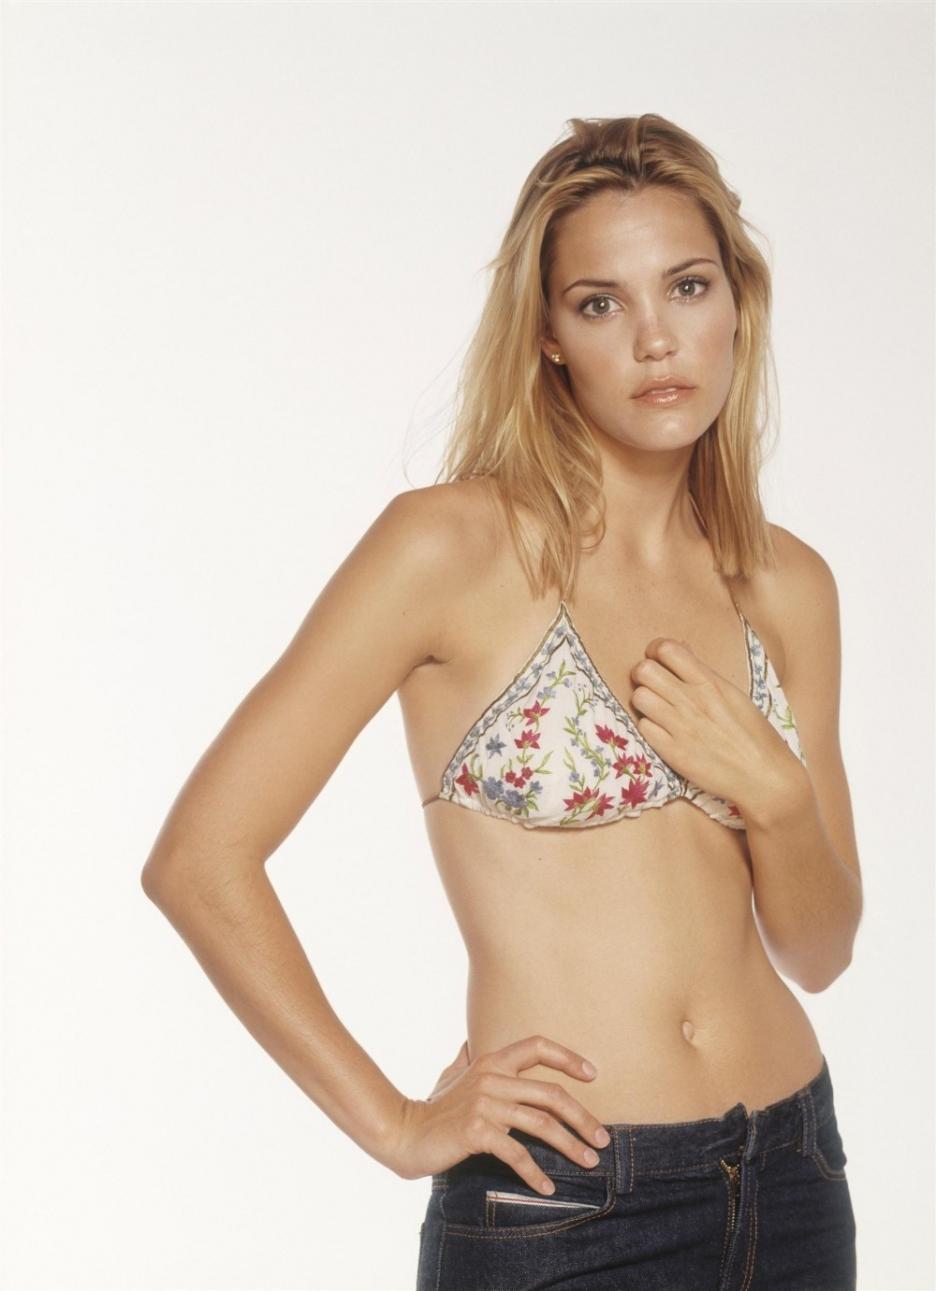 Leslie bibb bikini pics